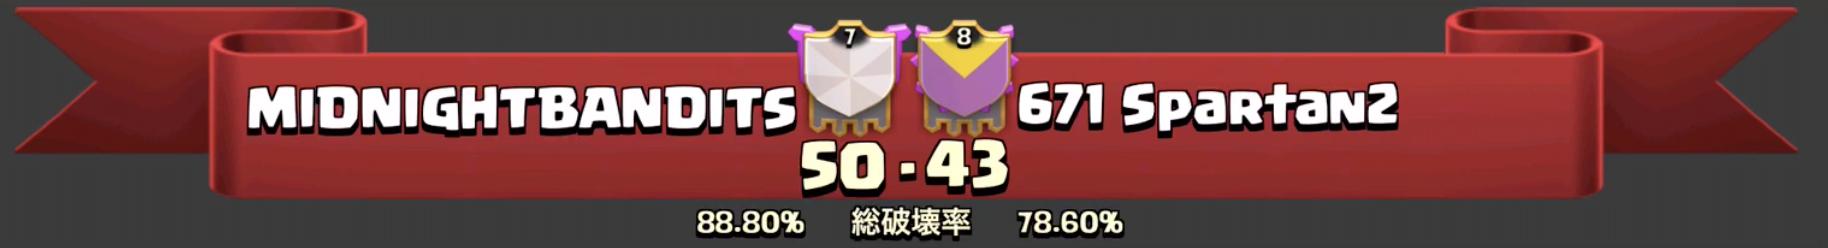 671 Spartan2